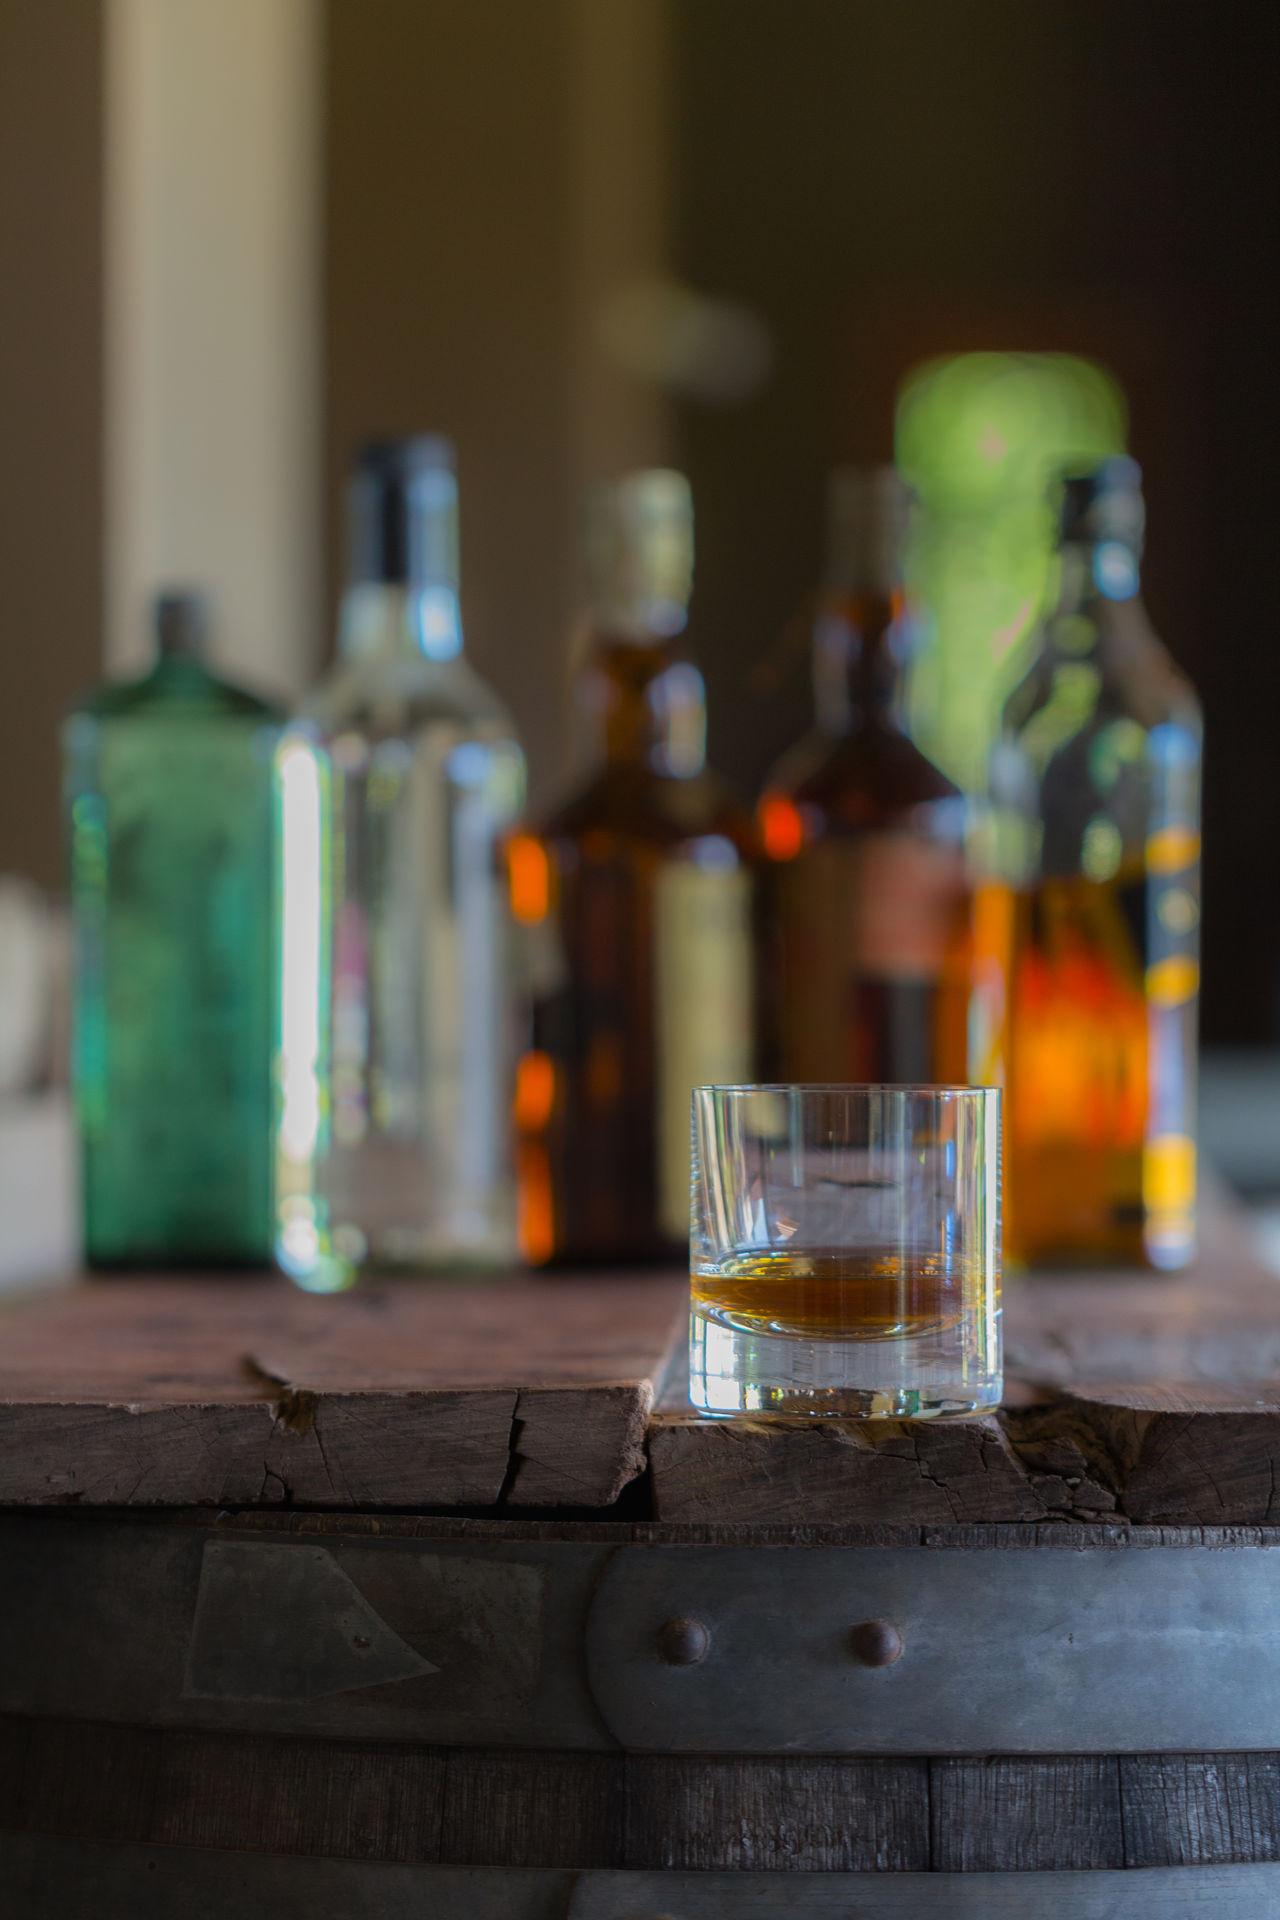 Golden GLAMOR Status Barrels Wood Indoors  Food And Drink Bar - Drink Establishment No People Drinking Glass Close-up Table Bar Bottles Whiskey Alcohol Drink Food And Drink Industry Barrel Food And Drink